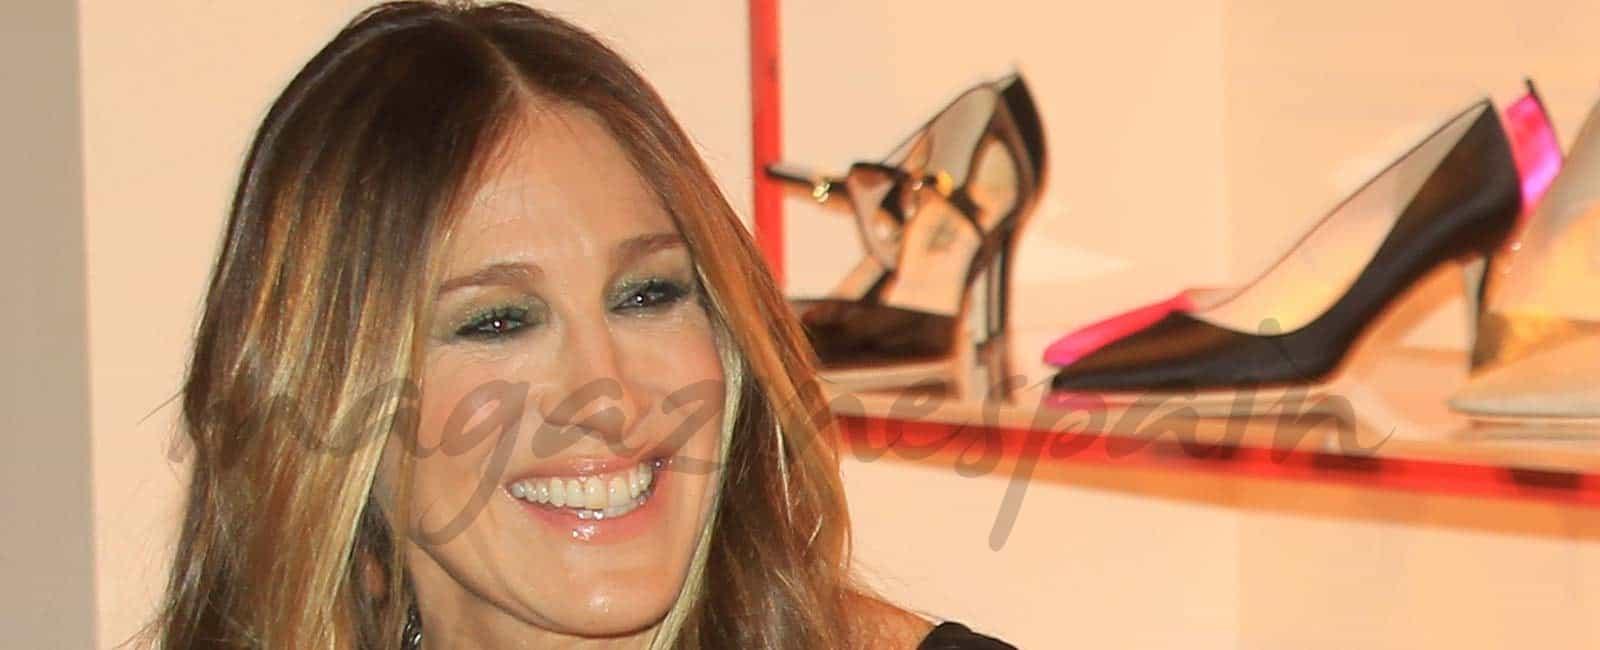 sarah jessica parker abre tienda zapatos